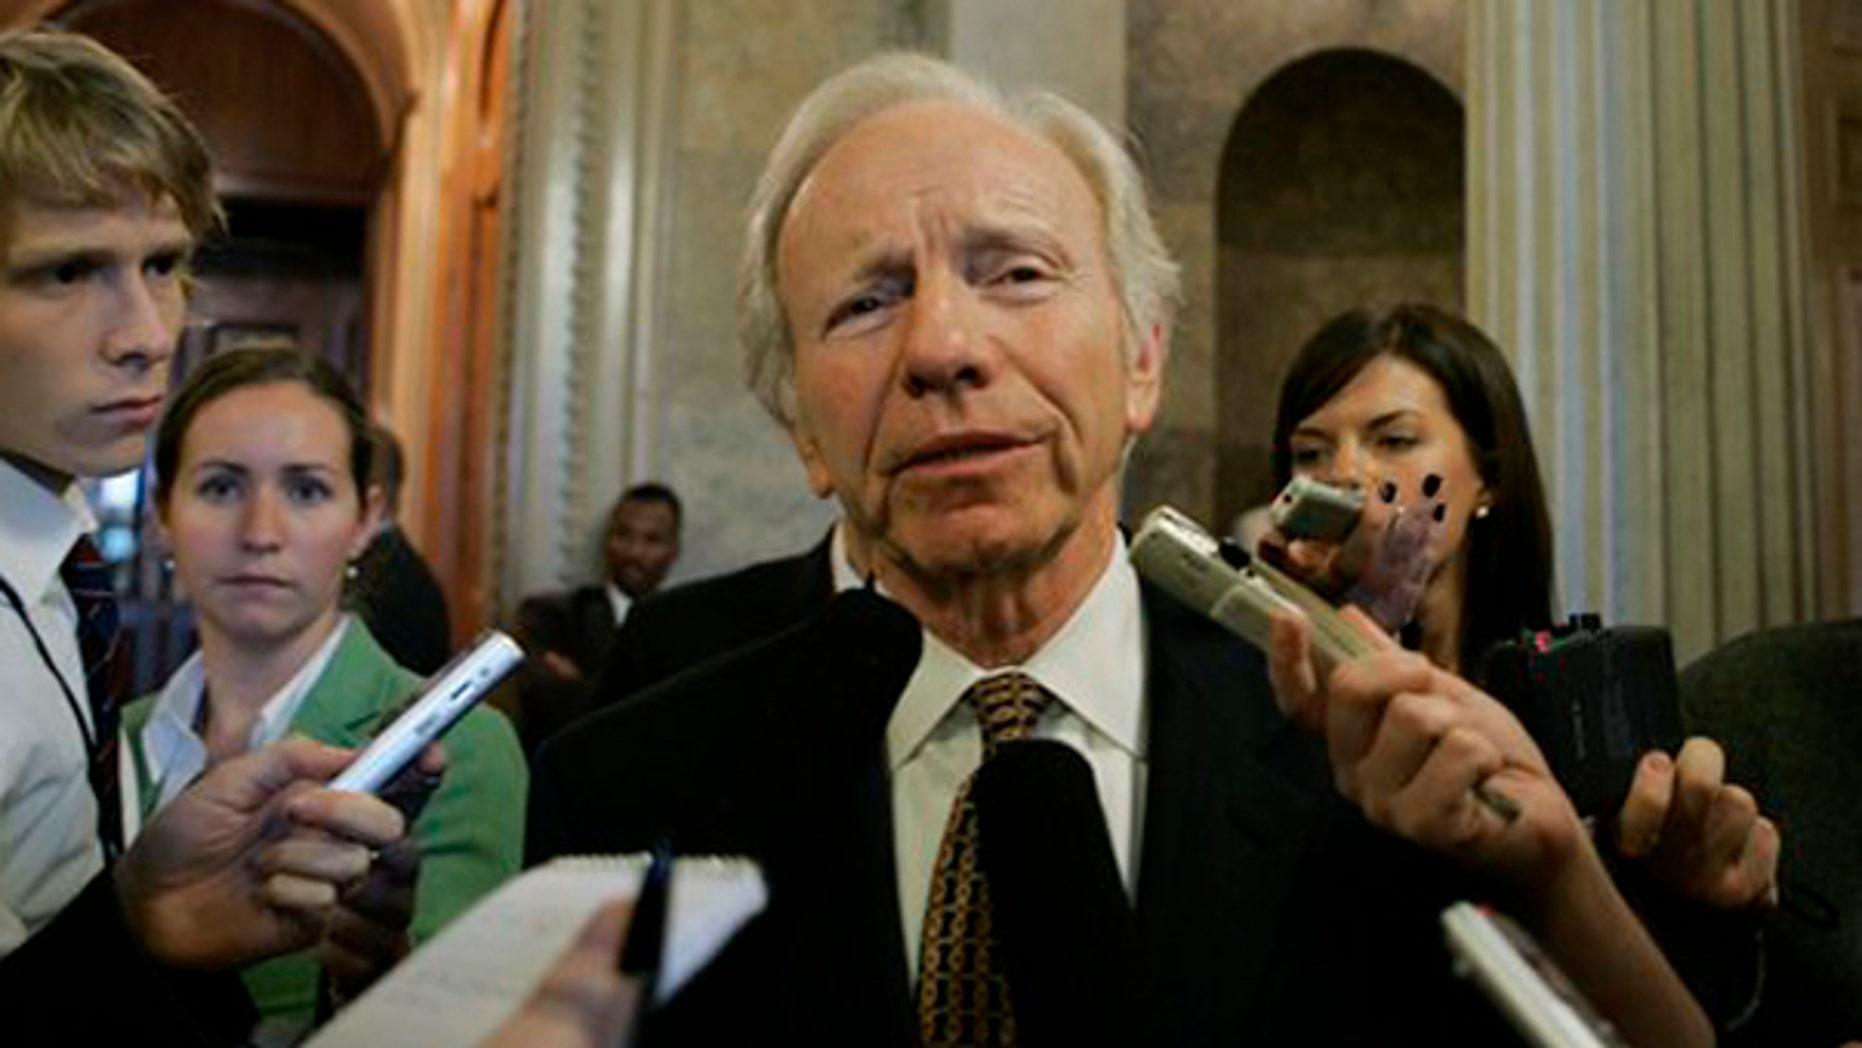 Sen. Joseph Lieberman speaks to reporters on Capitol Hill in Washington Oct. 27. (AP Photo)